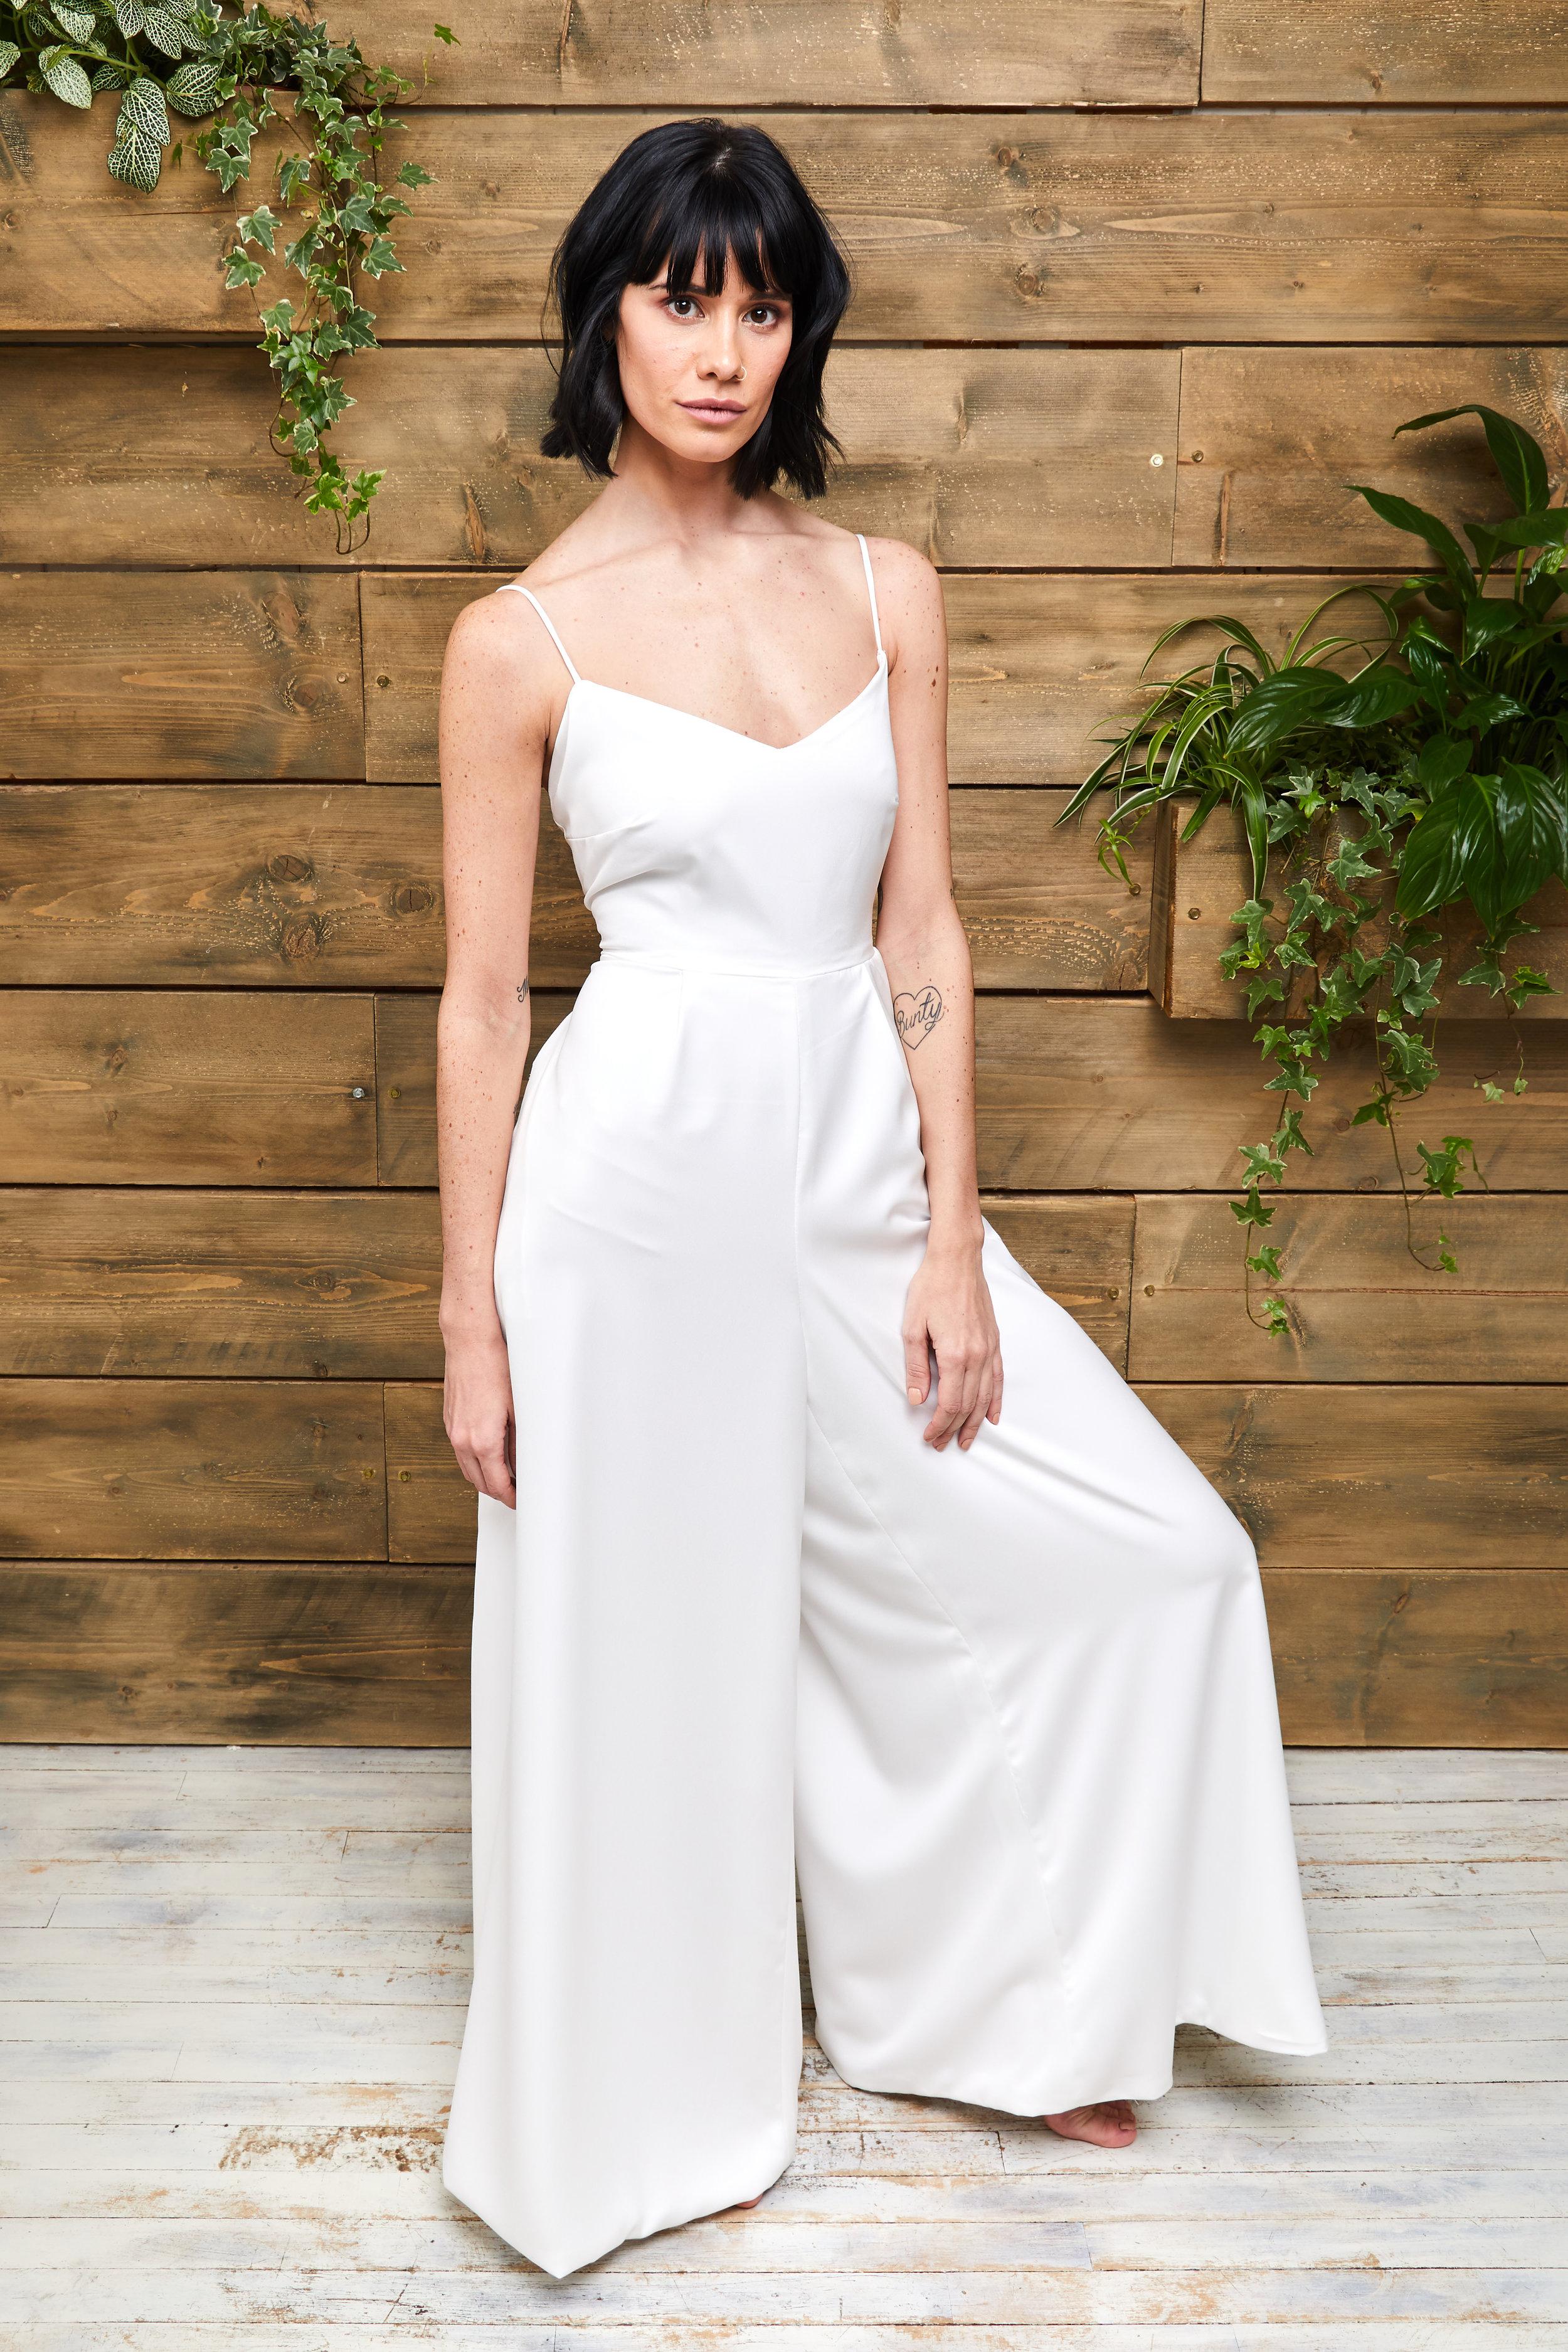 Rachel Burgess Bridal Boutique - Jamie.by E&W Couture - Photo by Tim Bishop jpg.jpg